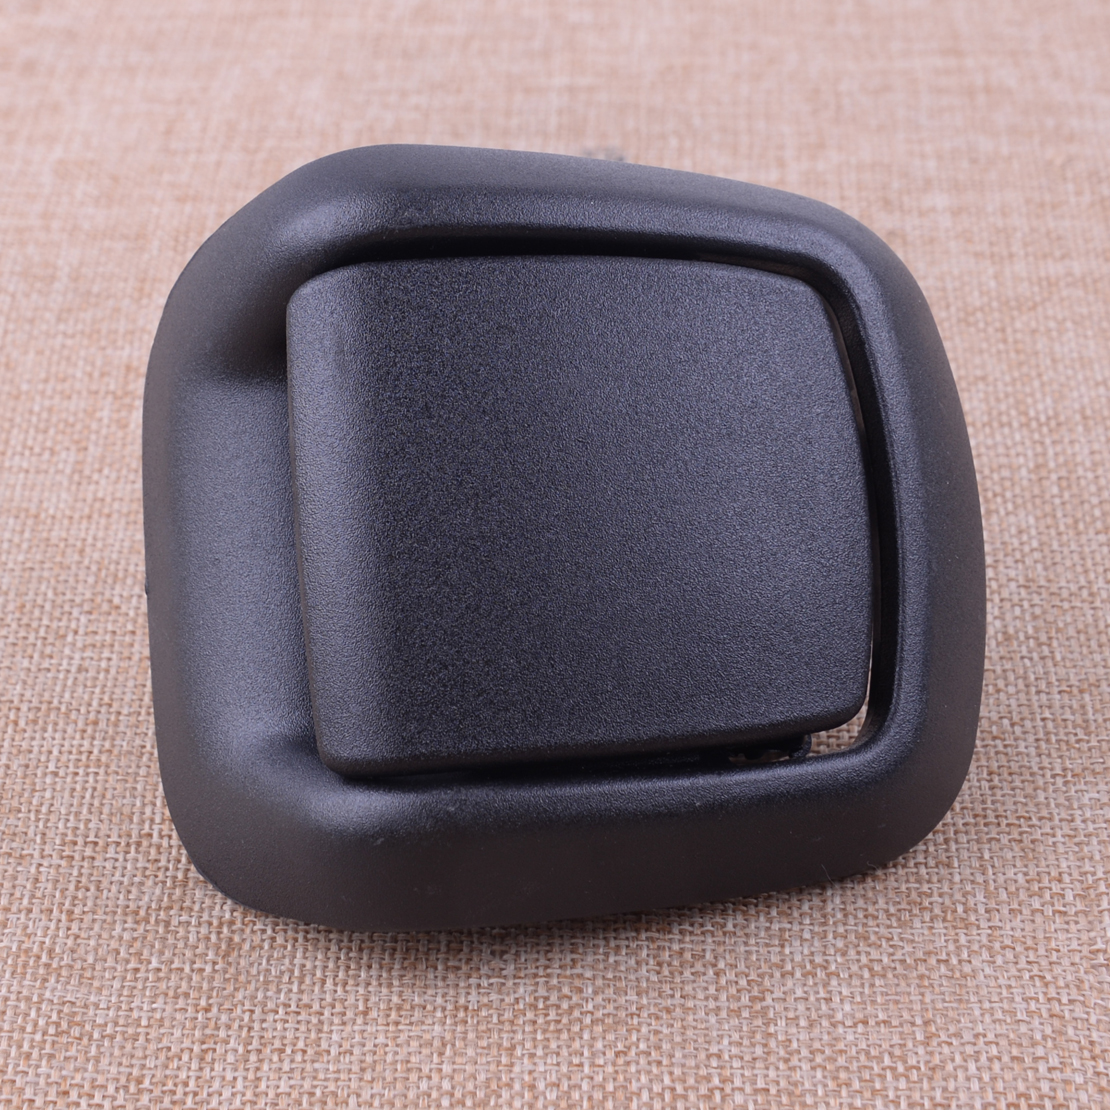 1417520 Plastic Black Car Side Front Right Seat Tilt Handle Fit For Ford Fiesta MK6 VI 3 Door 2002 2003 2004 2005 2006 2007 2008